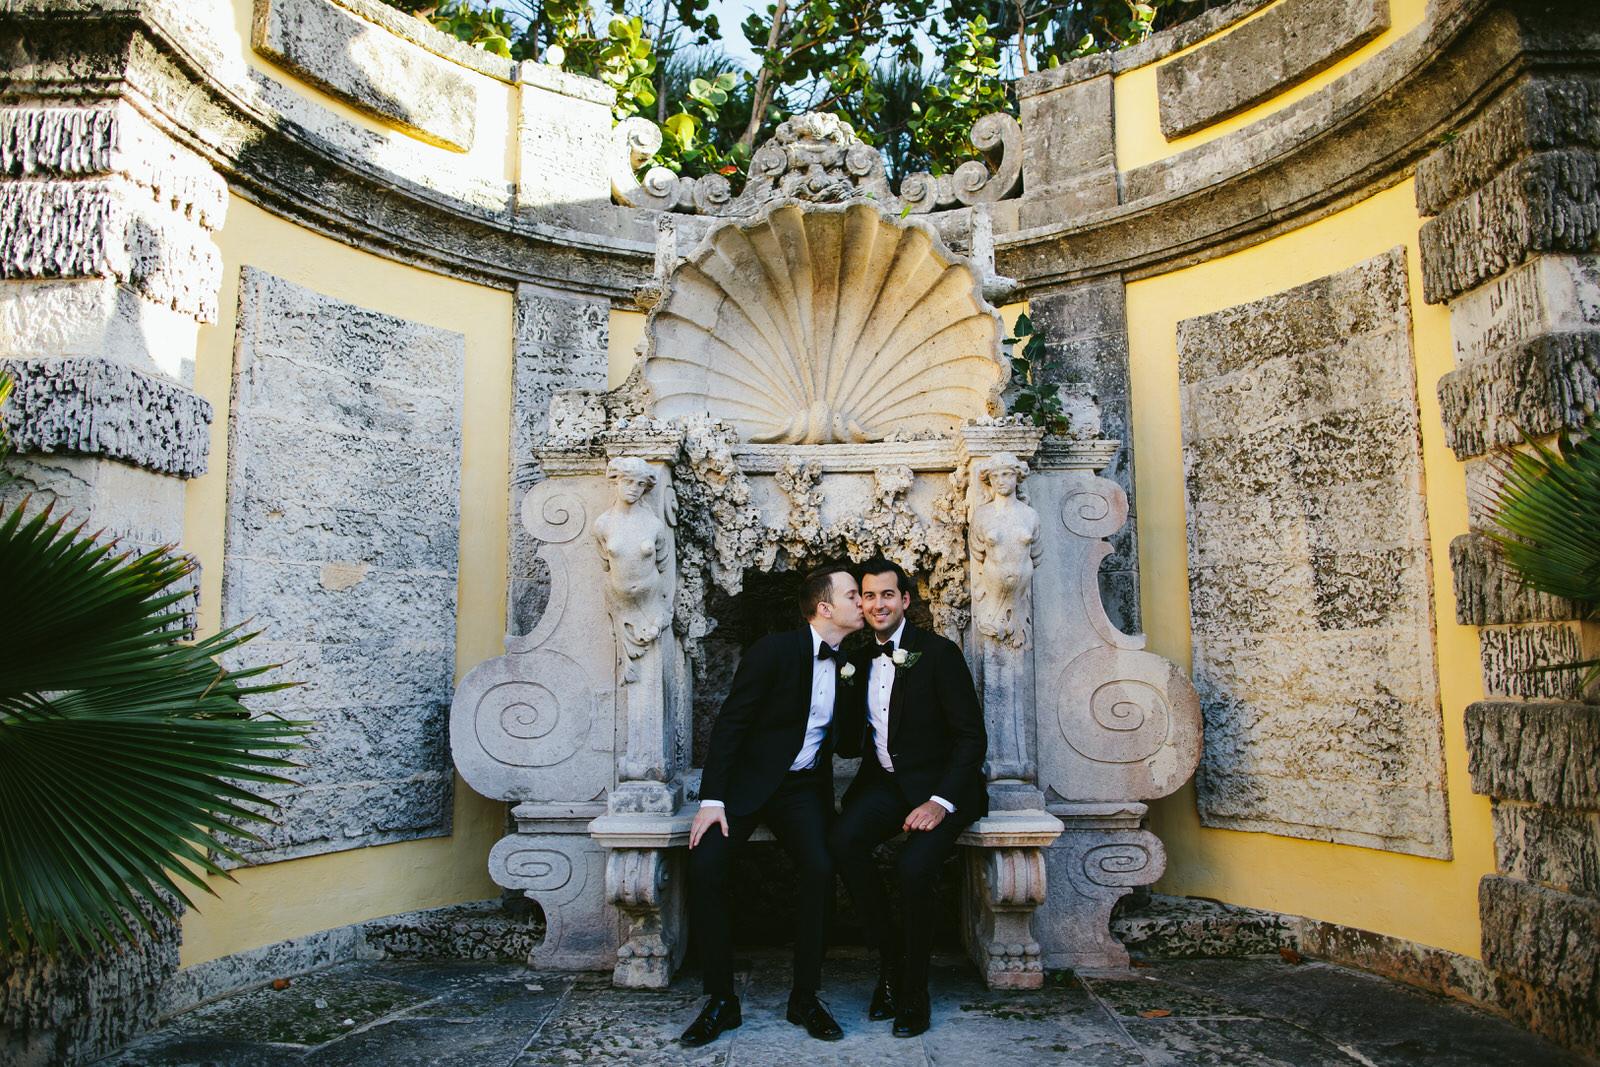 vizcaya_elopement_intimate_wedding_groom_portraits_after_ceremony-44.jpg